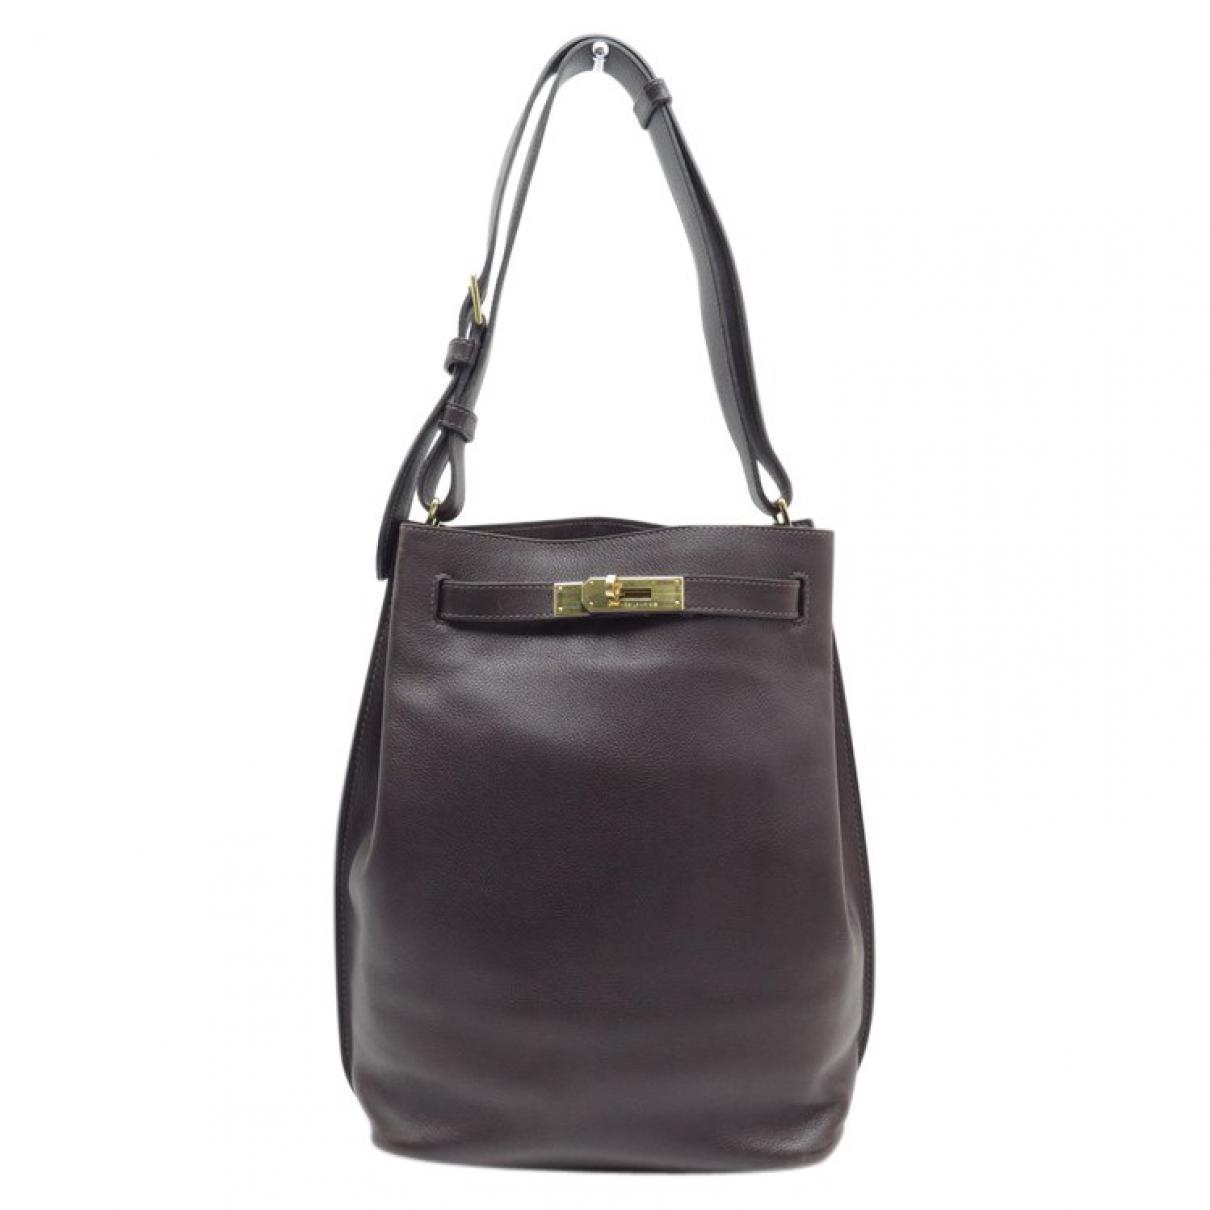 Hermès Pre-owned - Leather shoulder bag LLiuElEZx